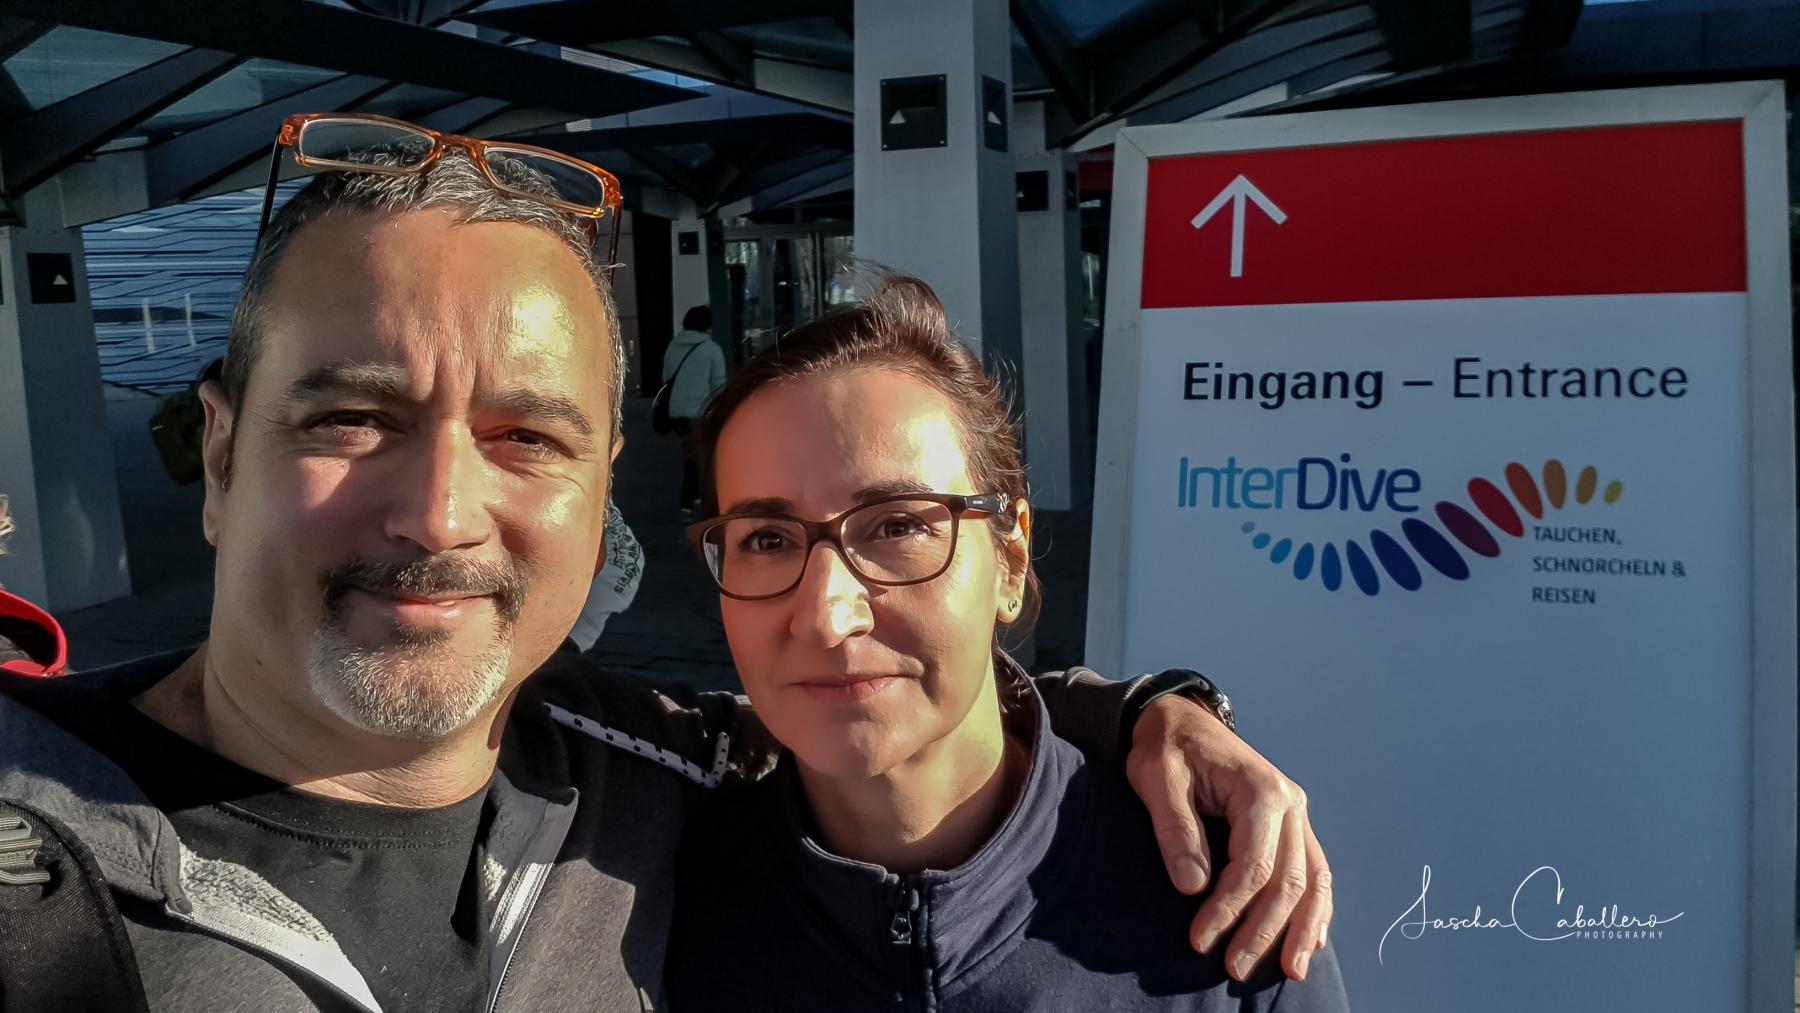 Inter Dive Frankfurt